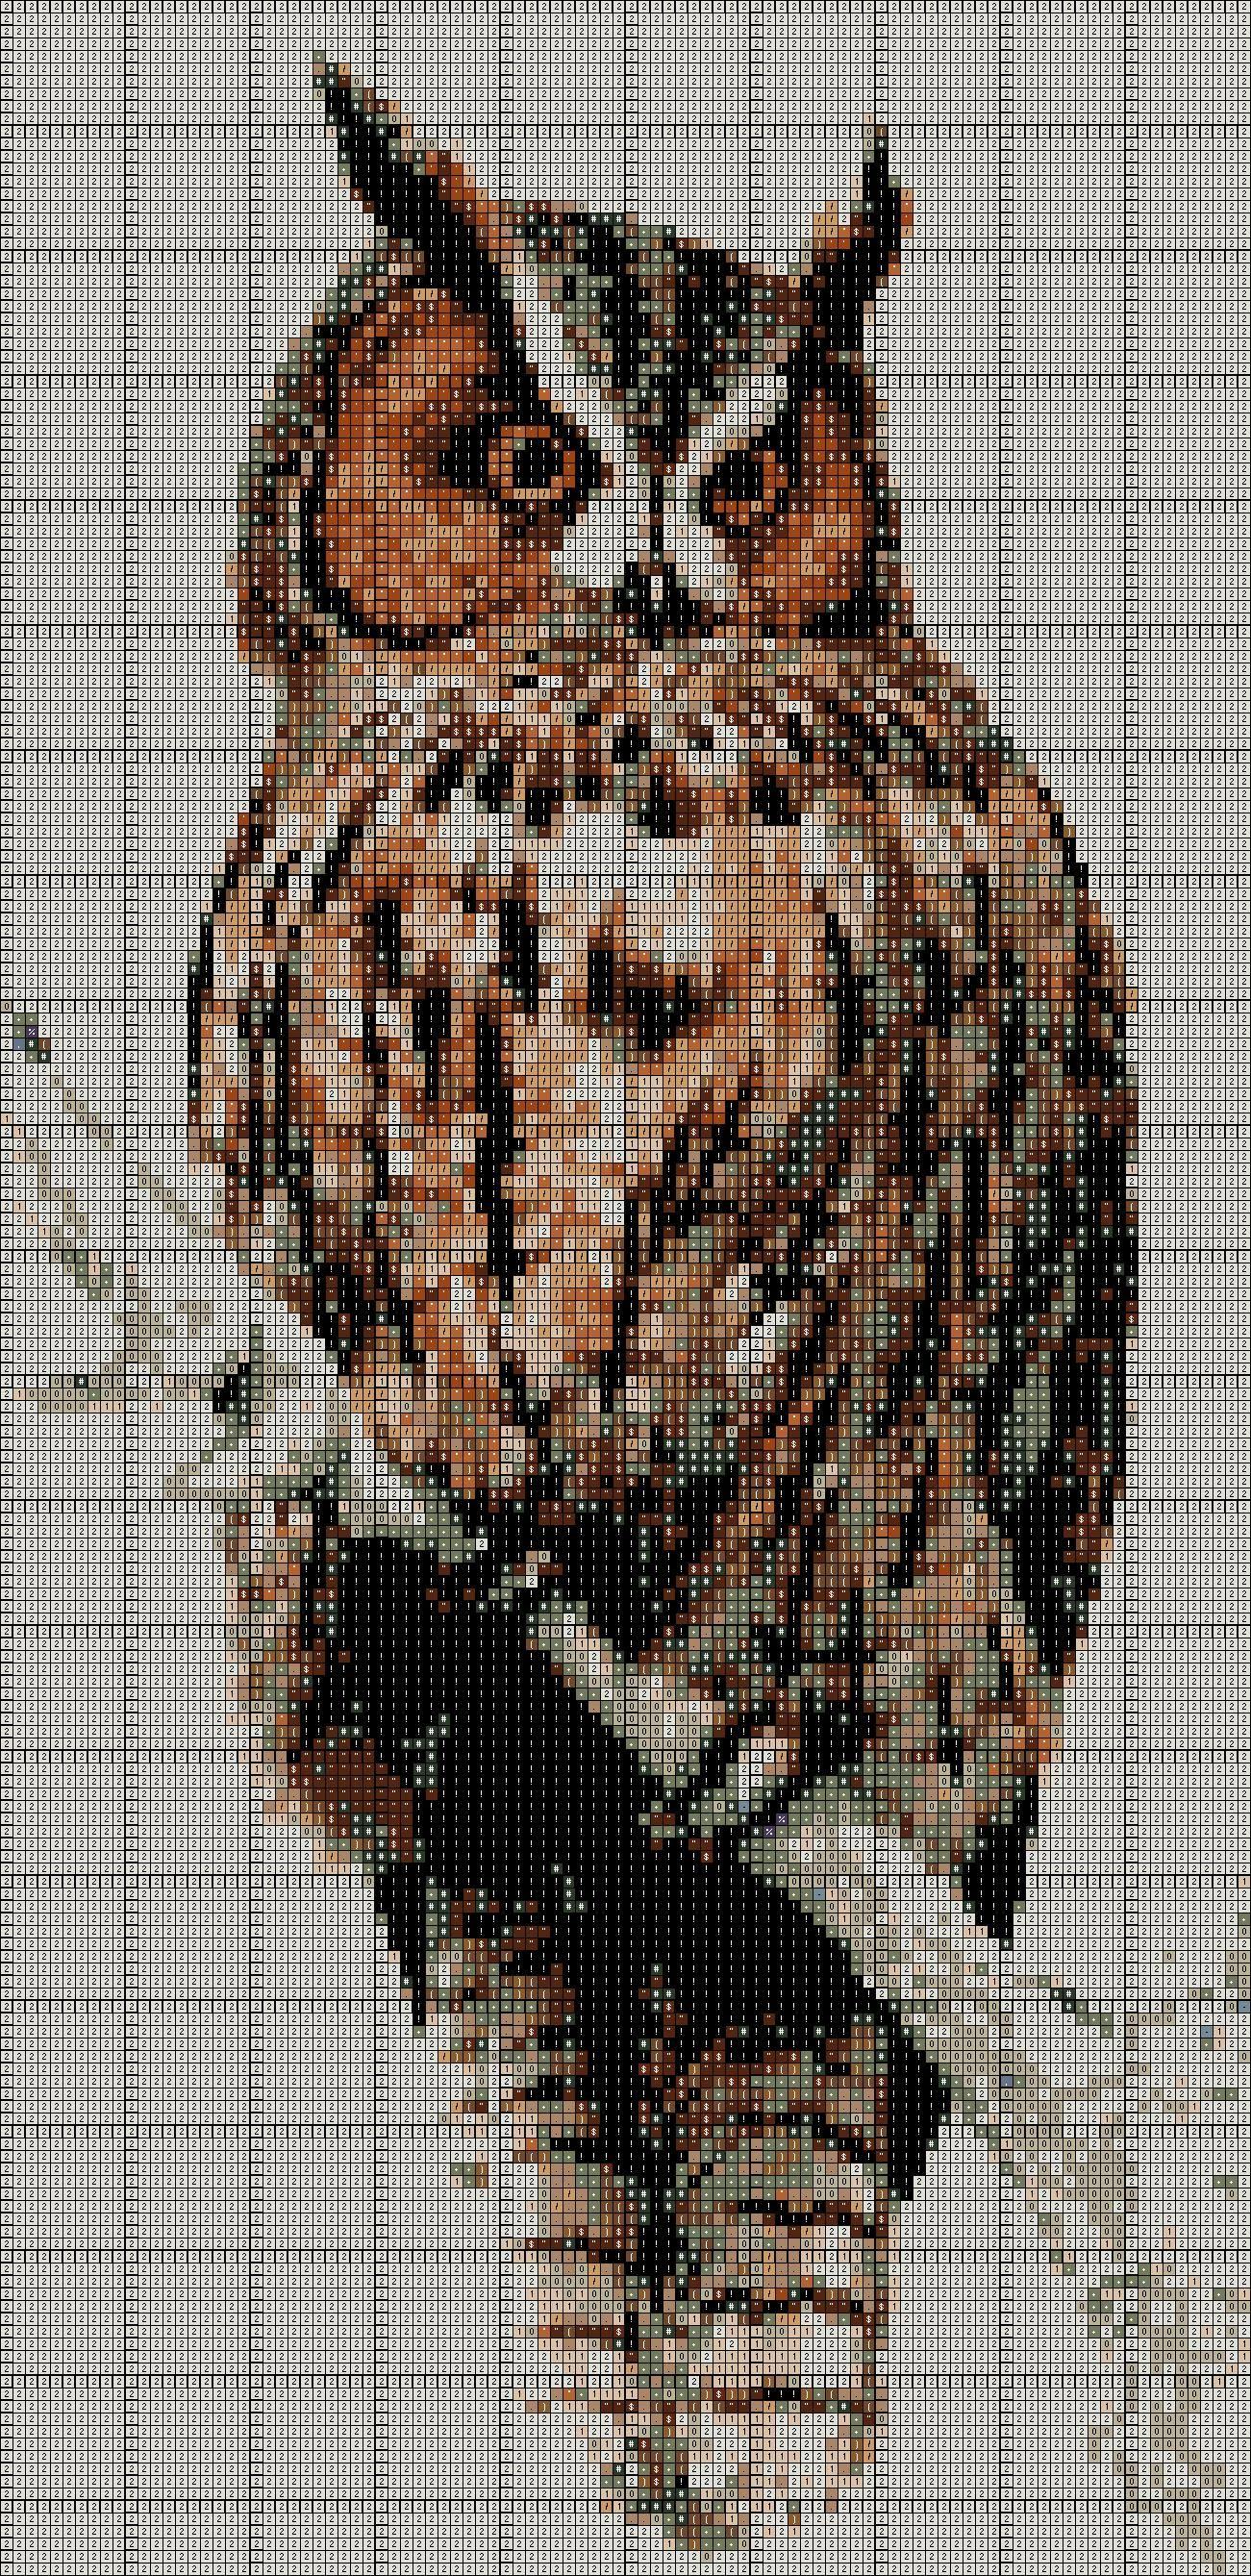 Pin de Lou Cariveau en Cross stitch | Pinterest | Punto de cruz ...